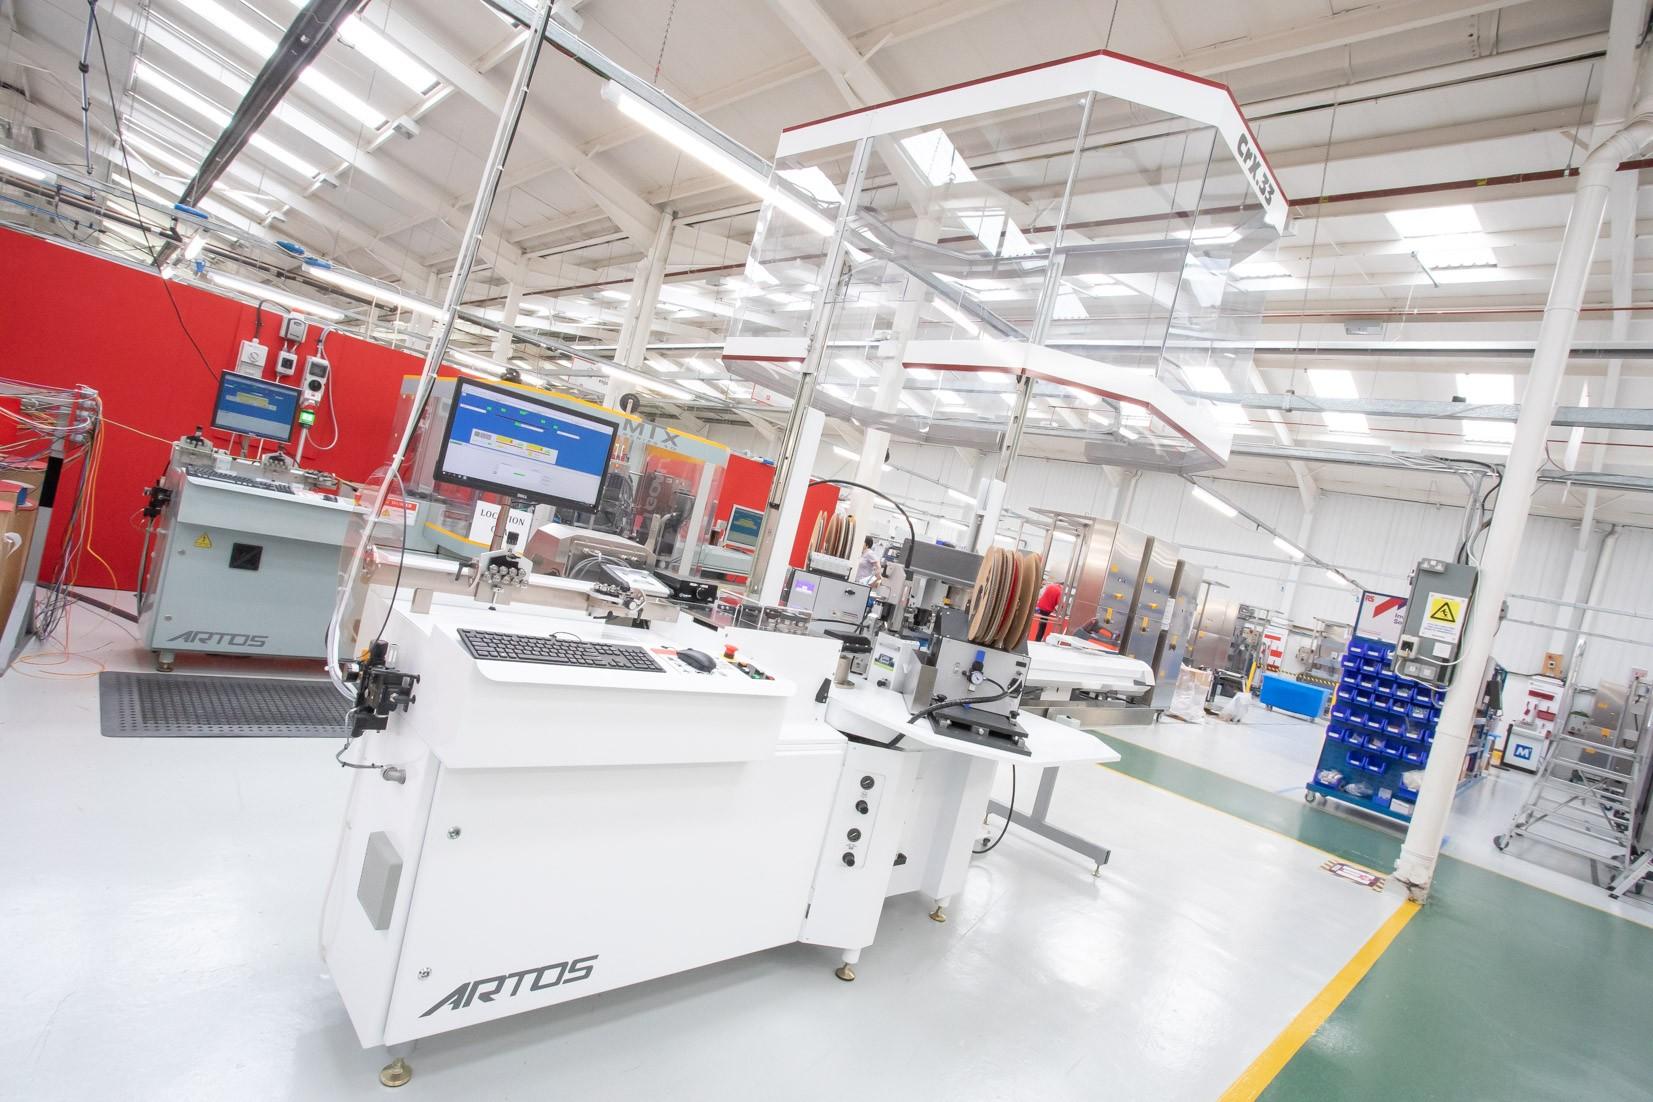 Build quality & test » artos 5 » PP Control & Automation